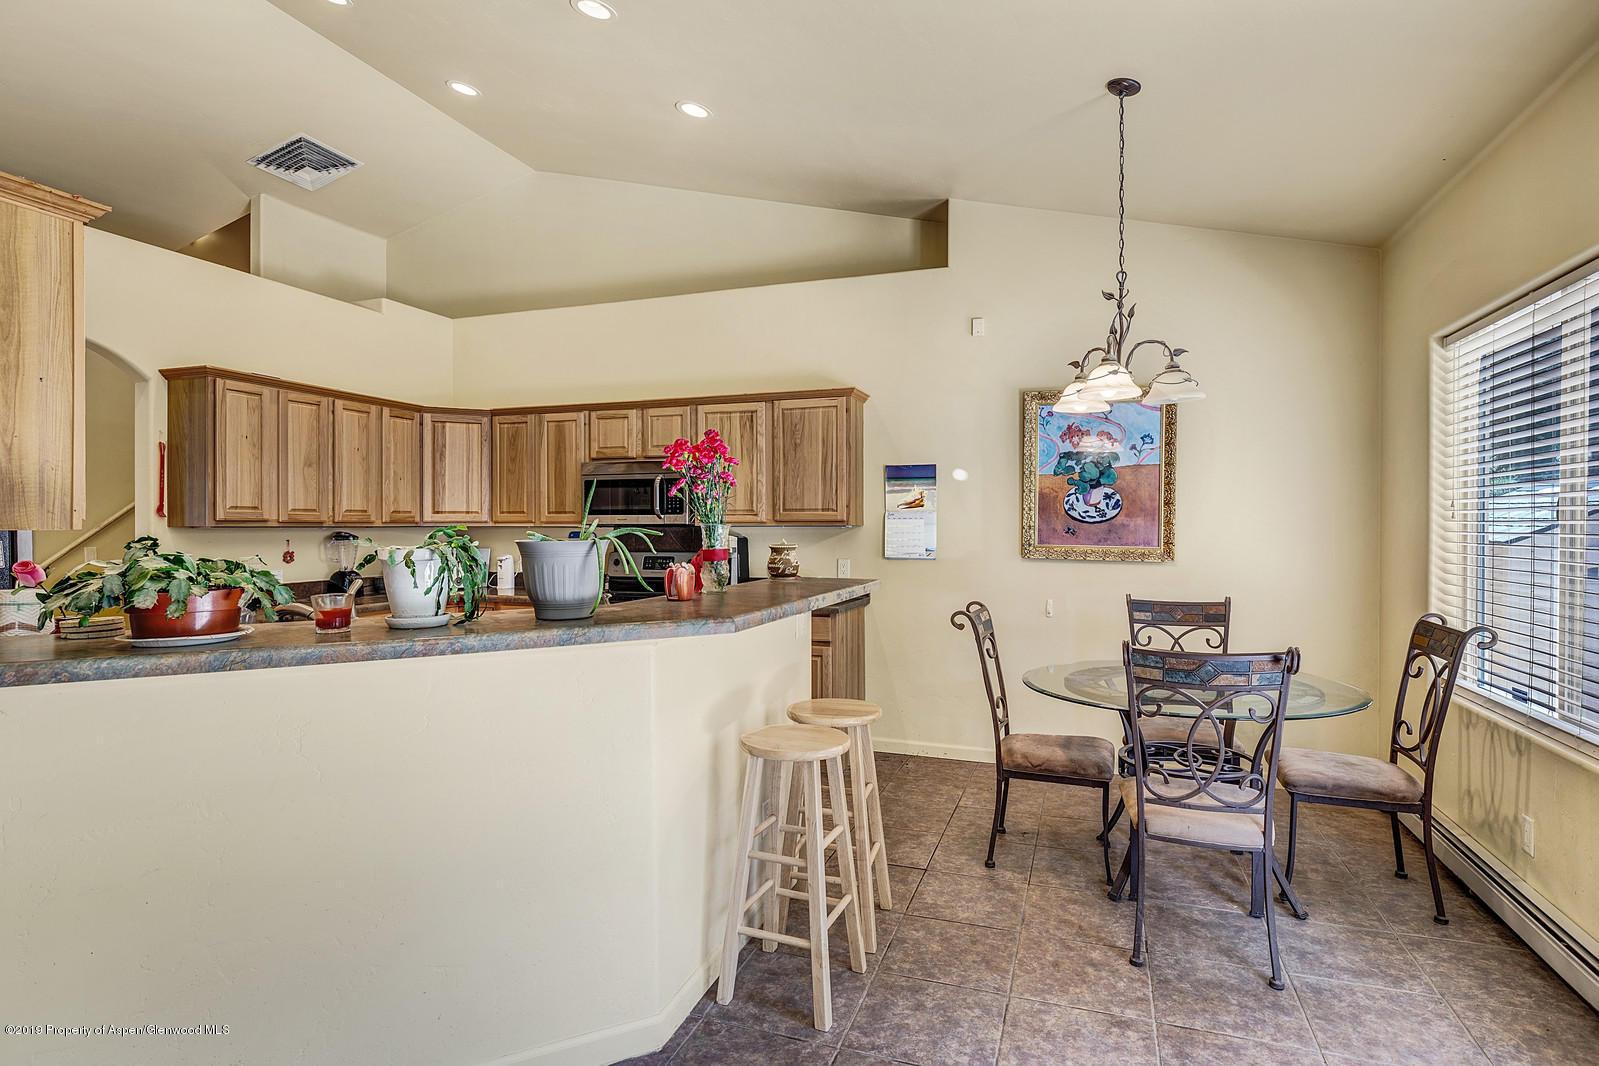 MLS# 159733 - 7 - 78 Willow Creek Trail, Battlement Mesa, CO 81635